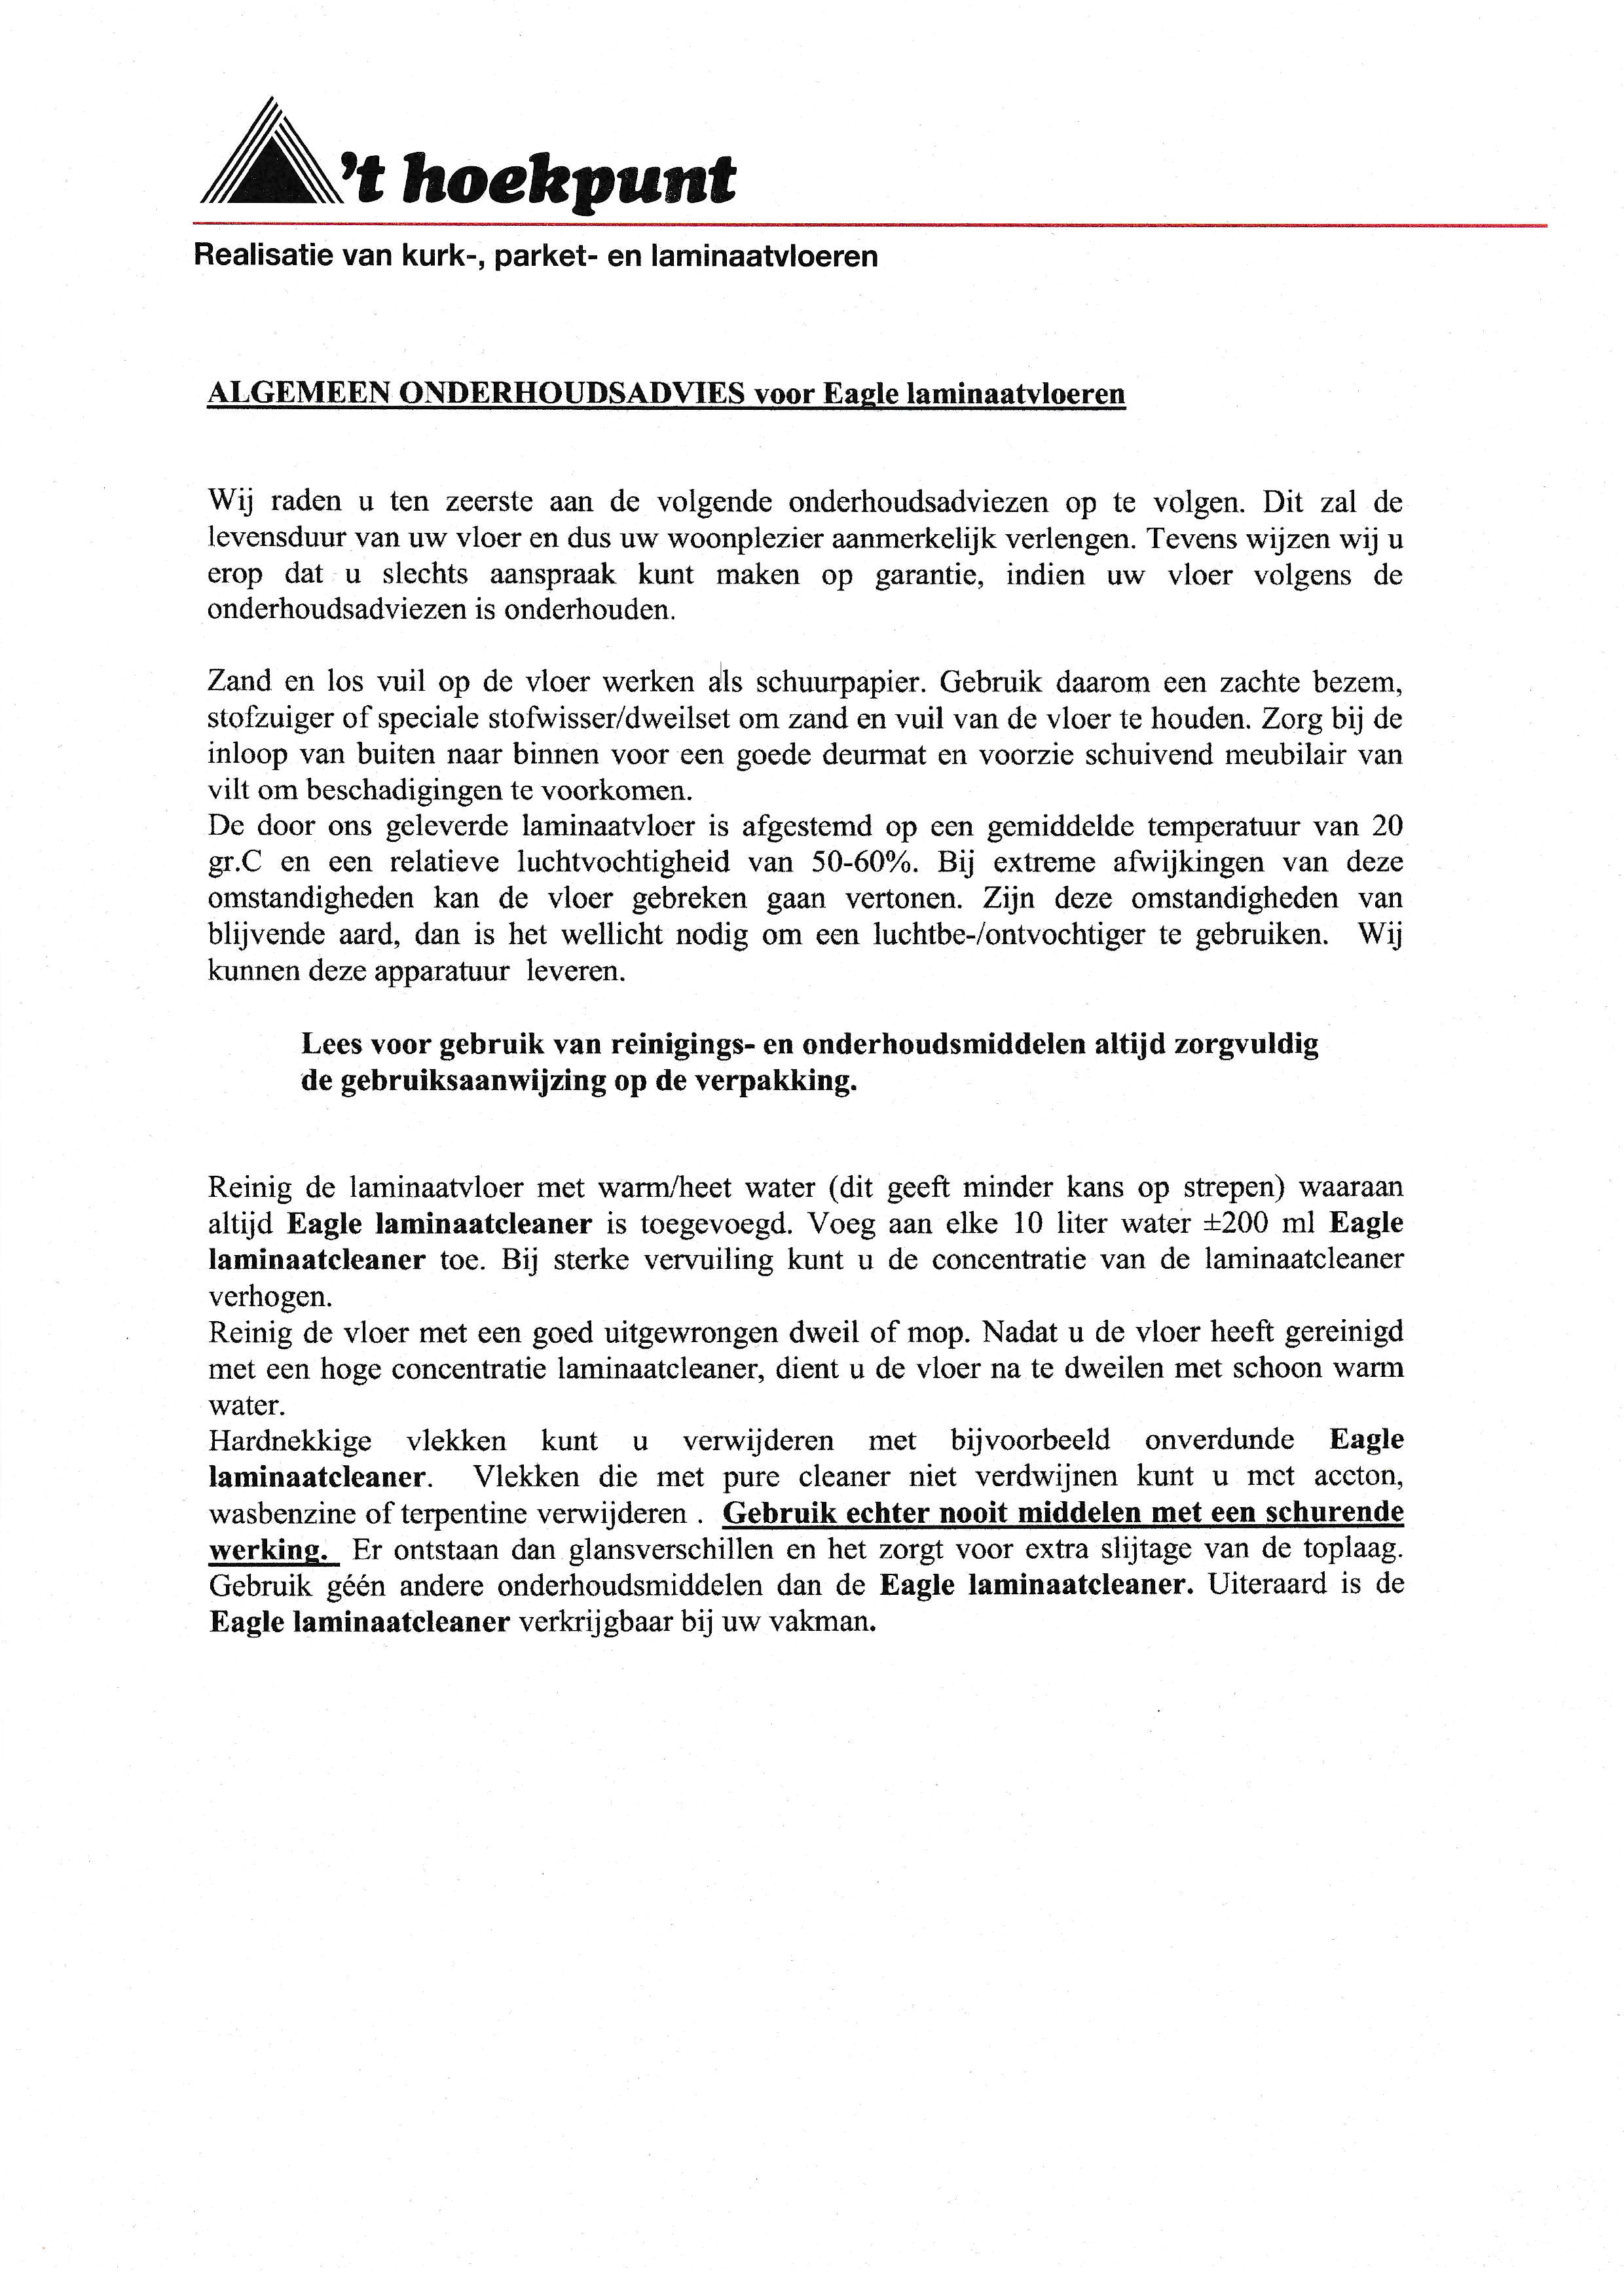 Eagle--laminaatvloeren-onderhoudsadvies